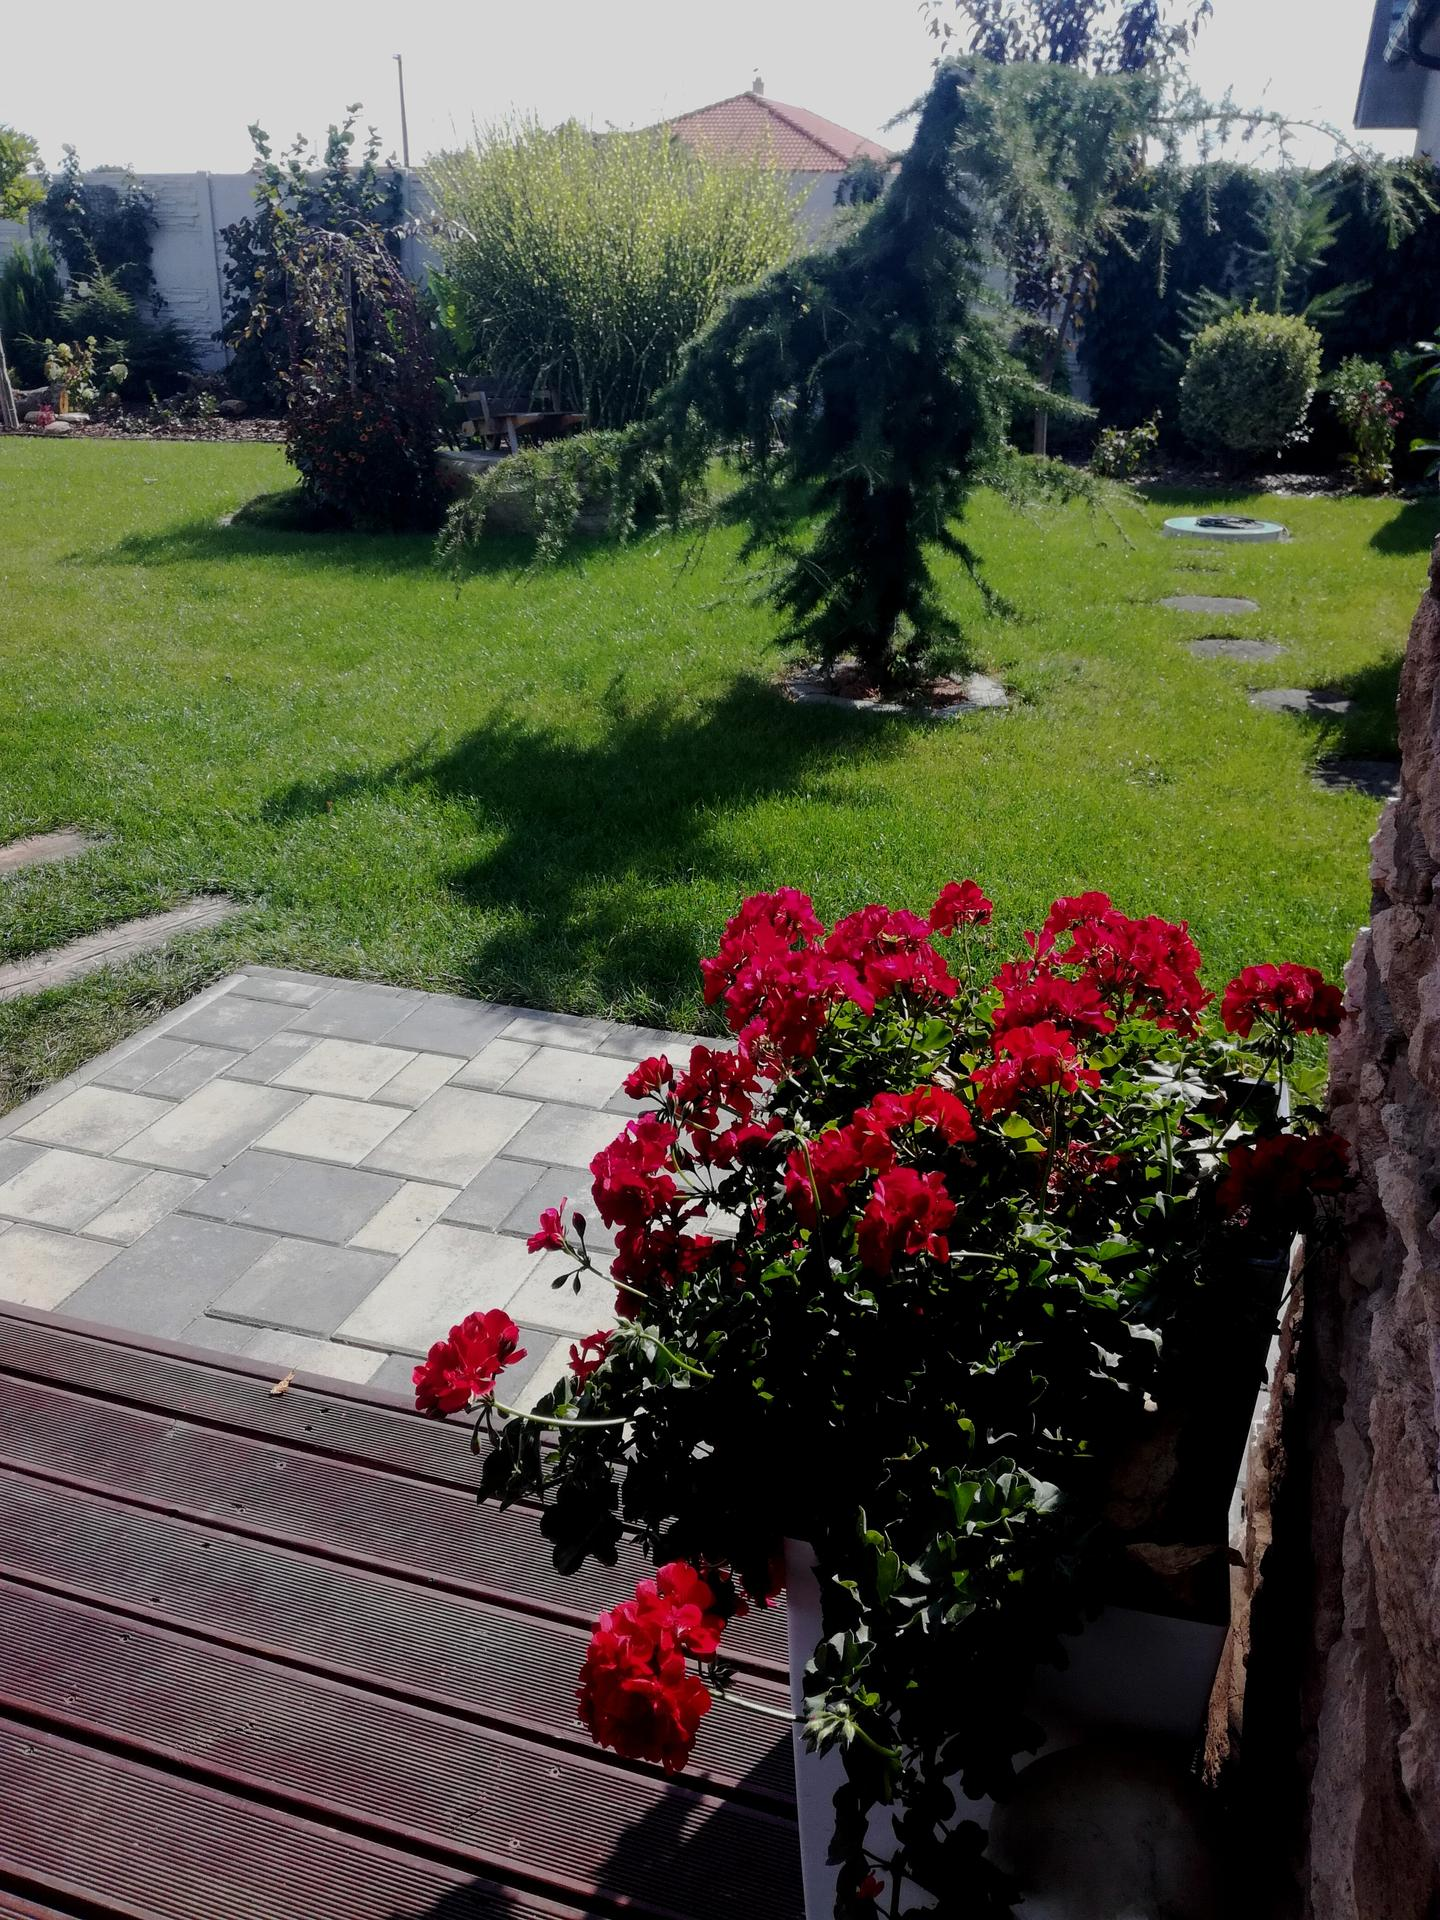 Zahrada 2021 🌲 - Obrázek č. 202